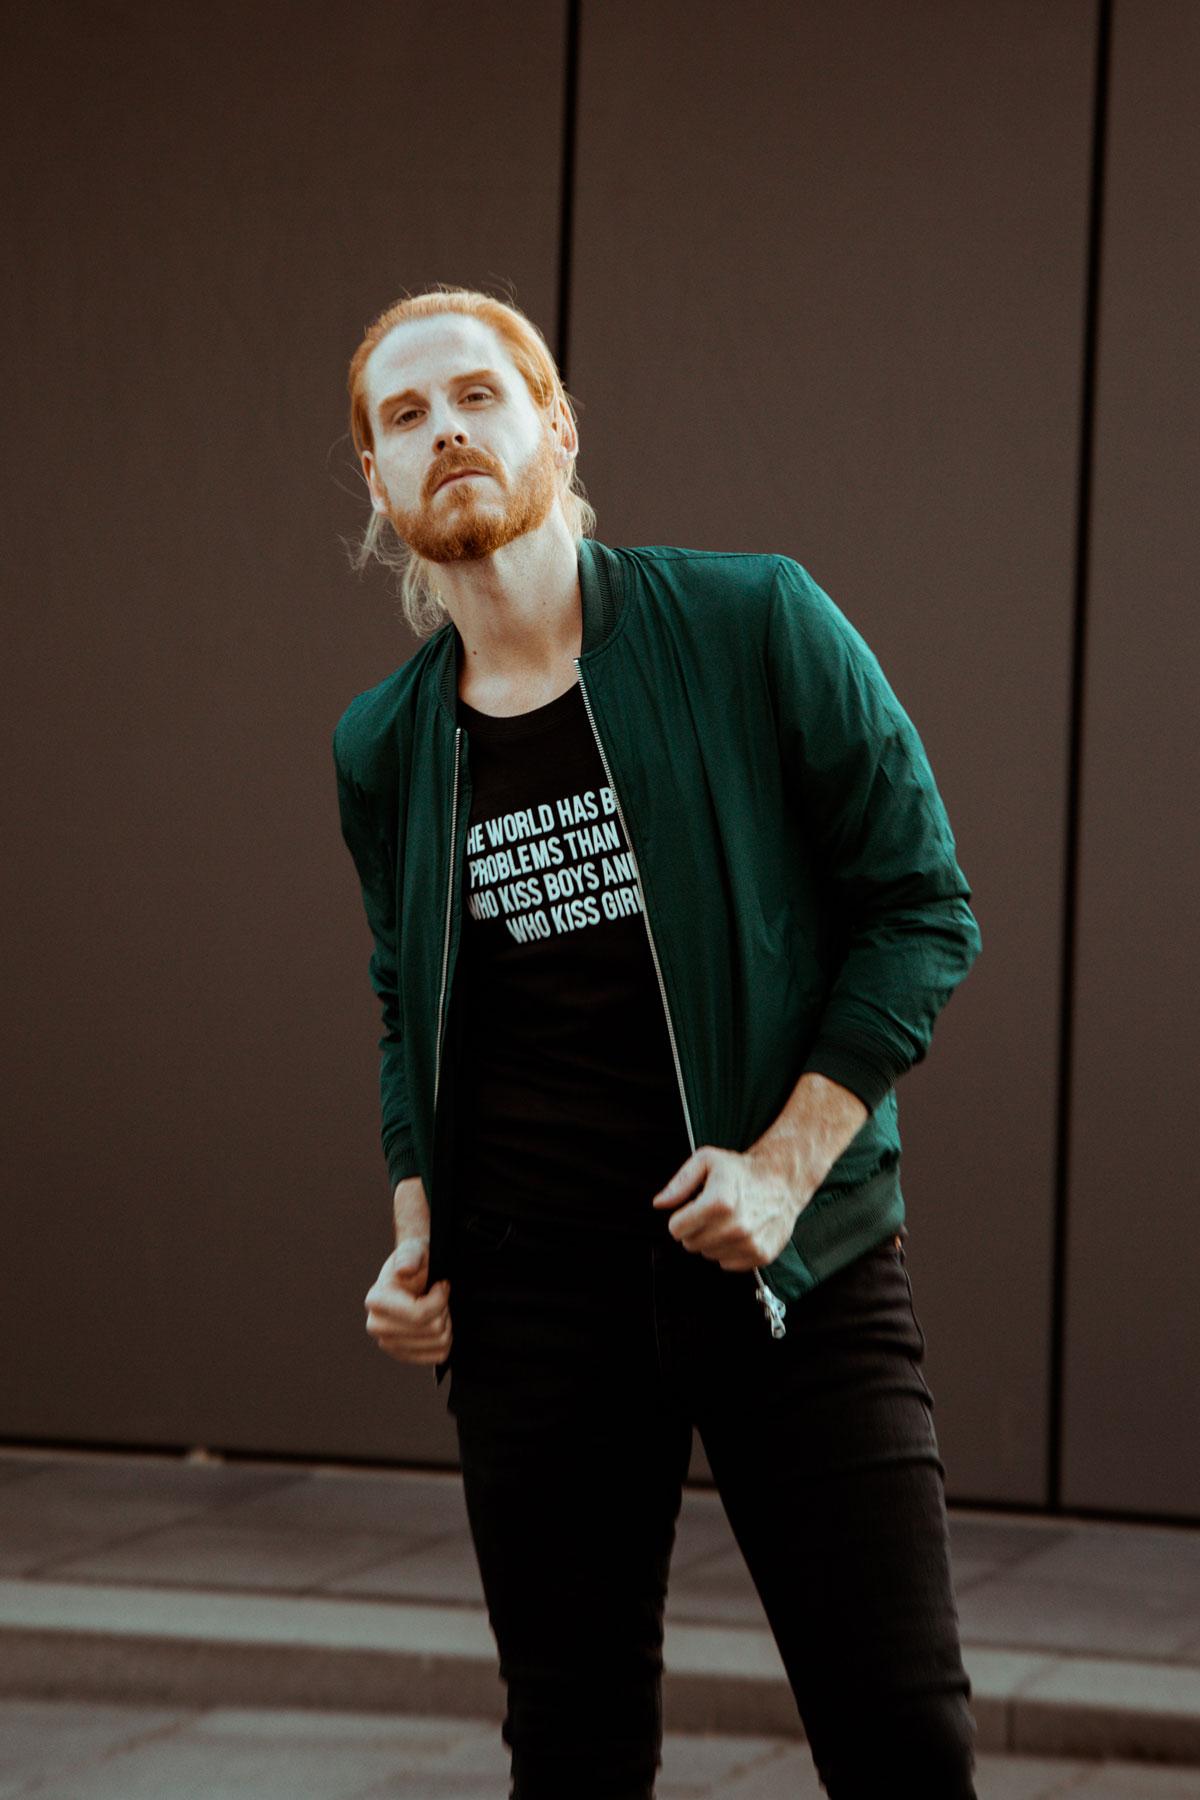 Malefashion-Streetstyle-Statement-Shirt-Gayboy-Ginger-Jeans